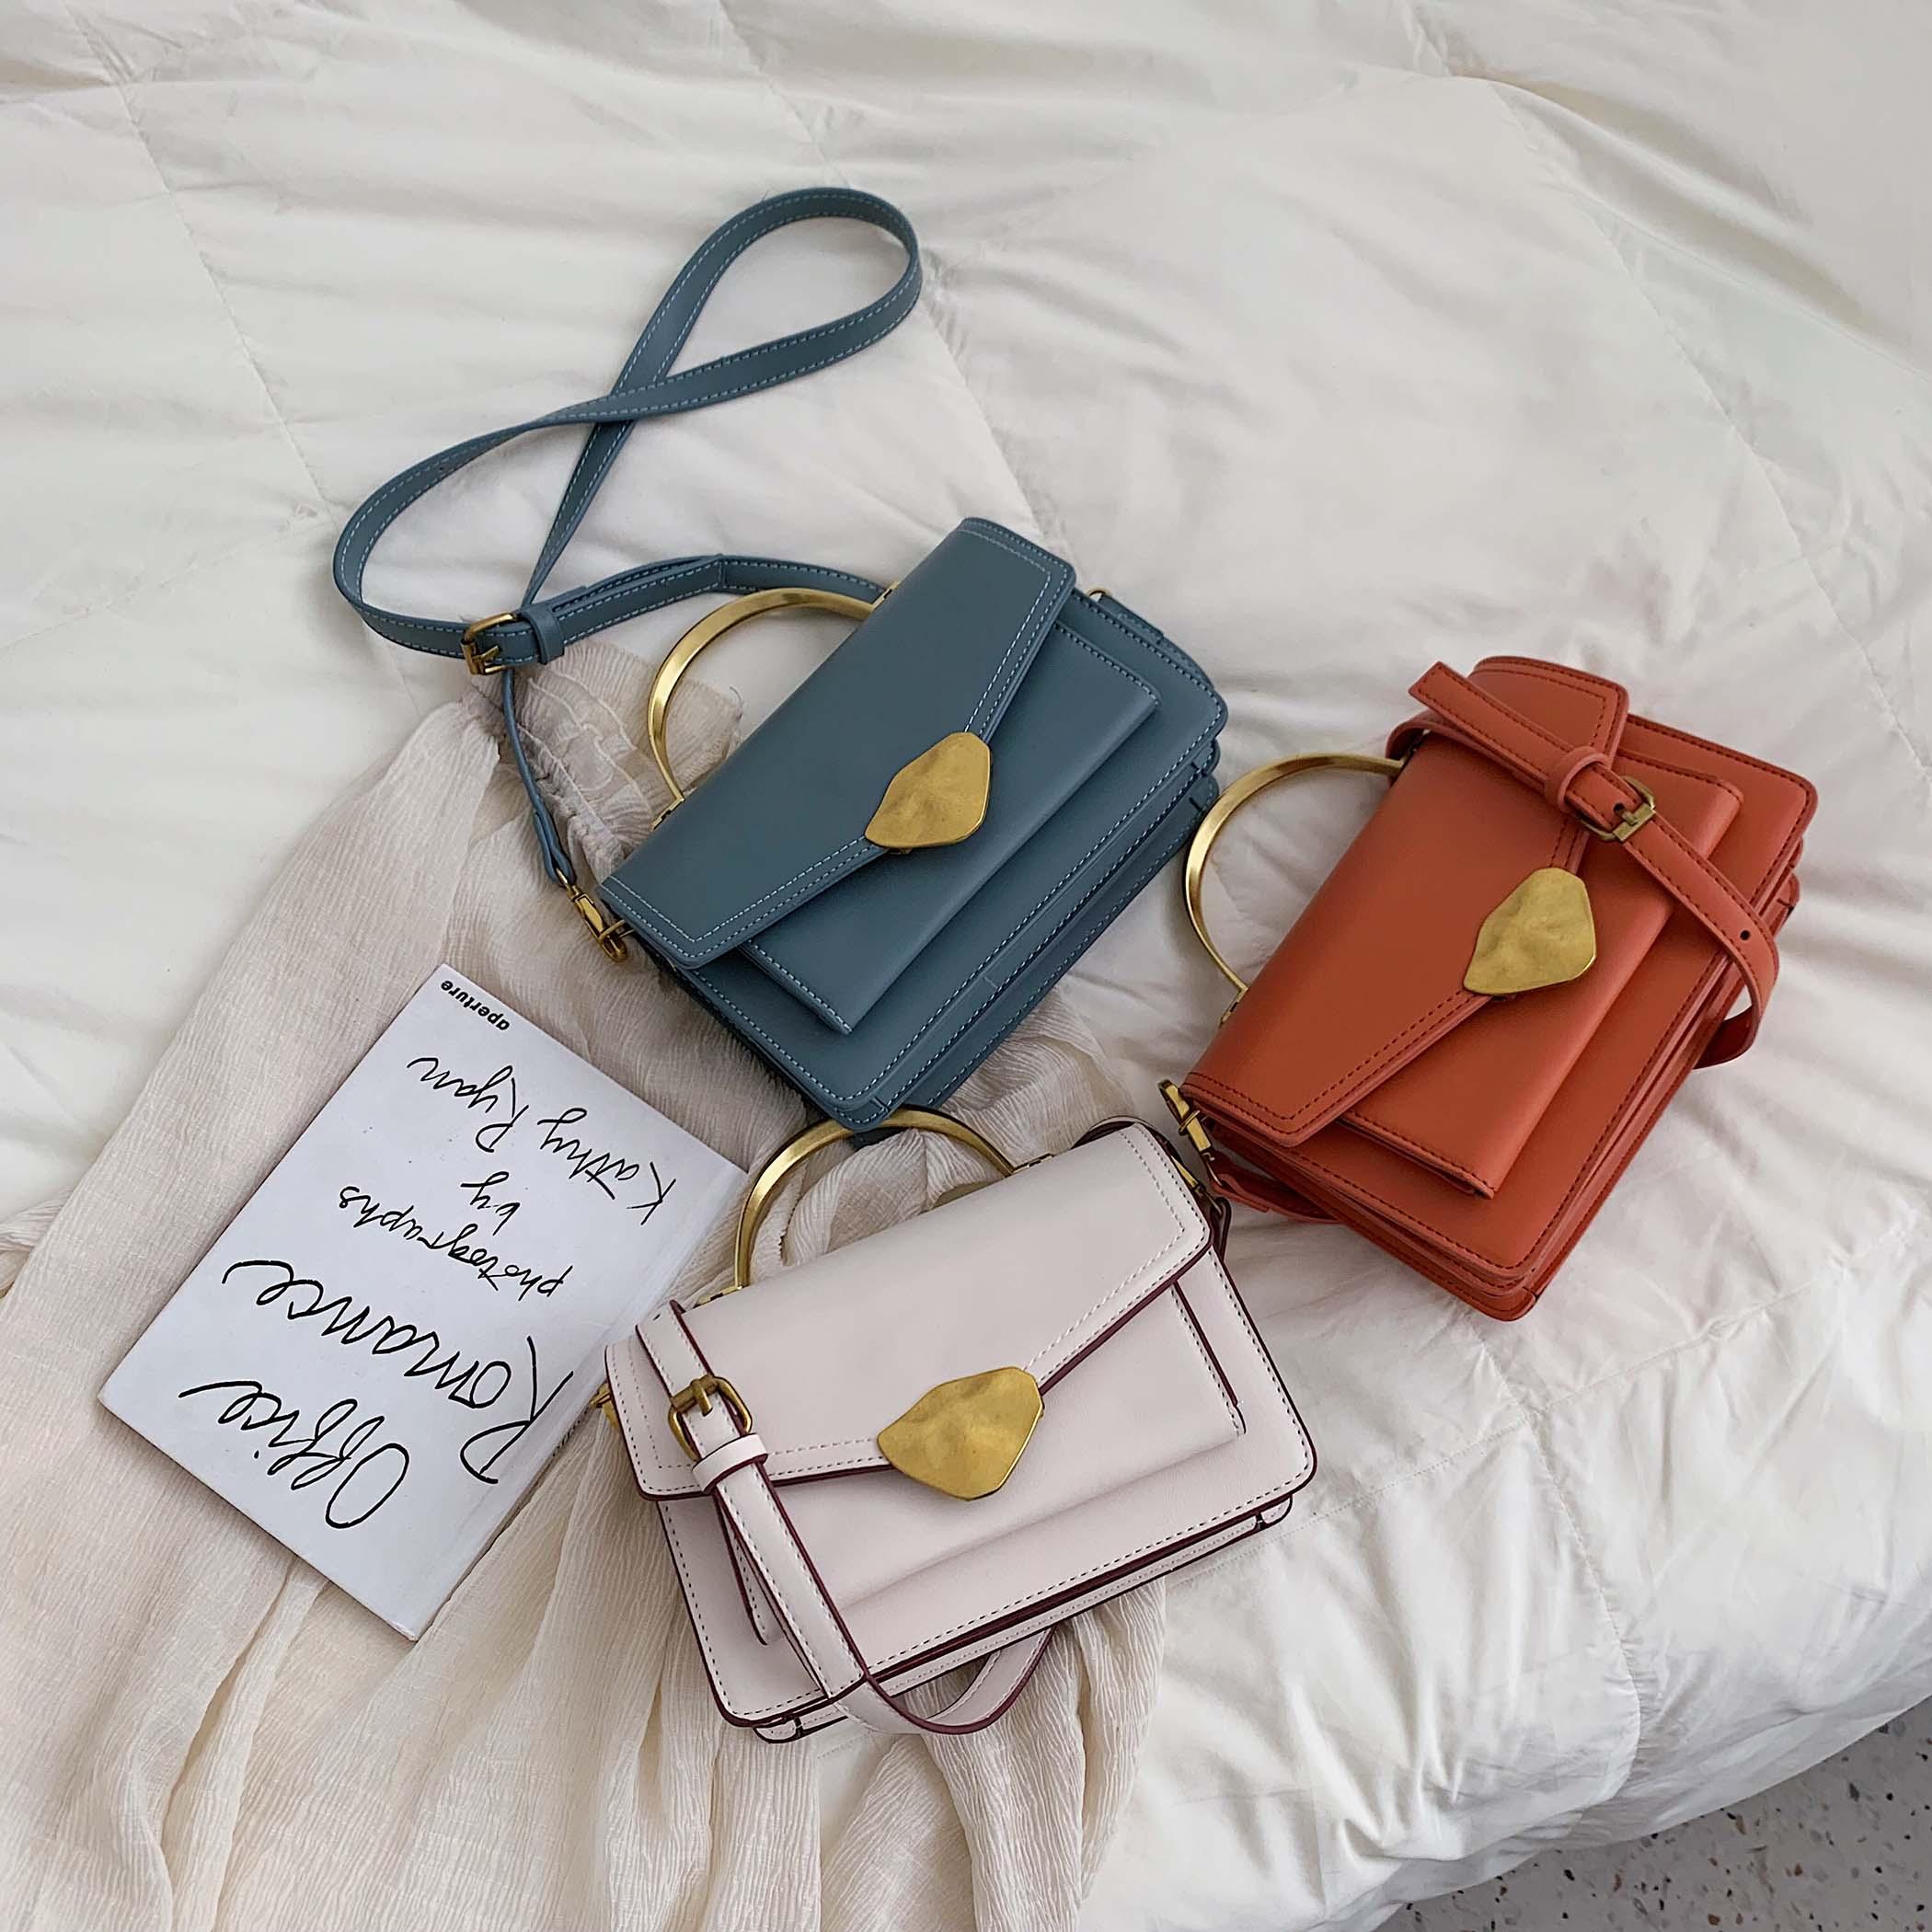 Image 5 - Simply Style PU Leather Crossbody Bags For Women Shoulder Messenger Bag Handbag Mini Tote Hand Bag With Metal Handle-in Shoulder Bags from Luggage & Bags